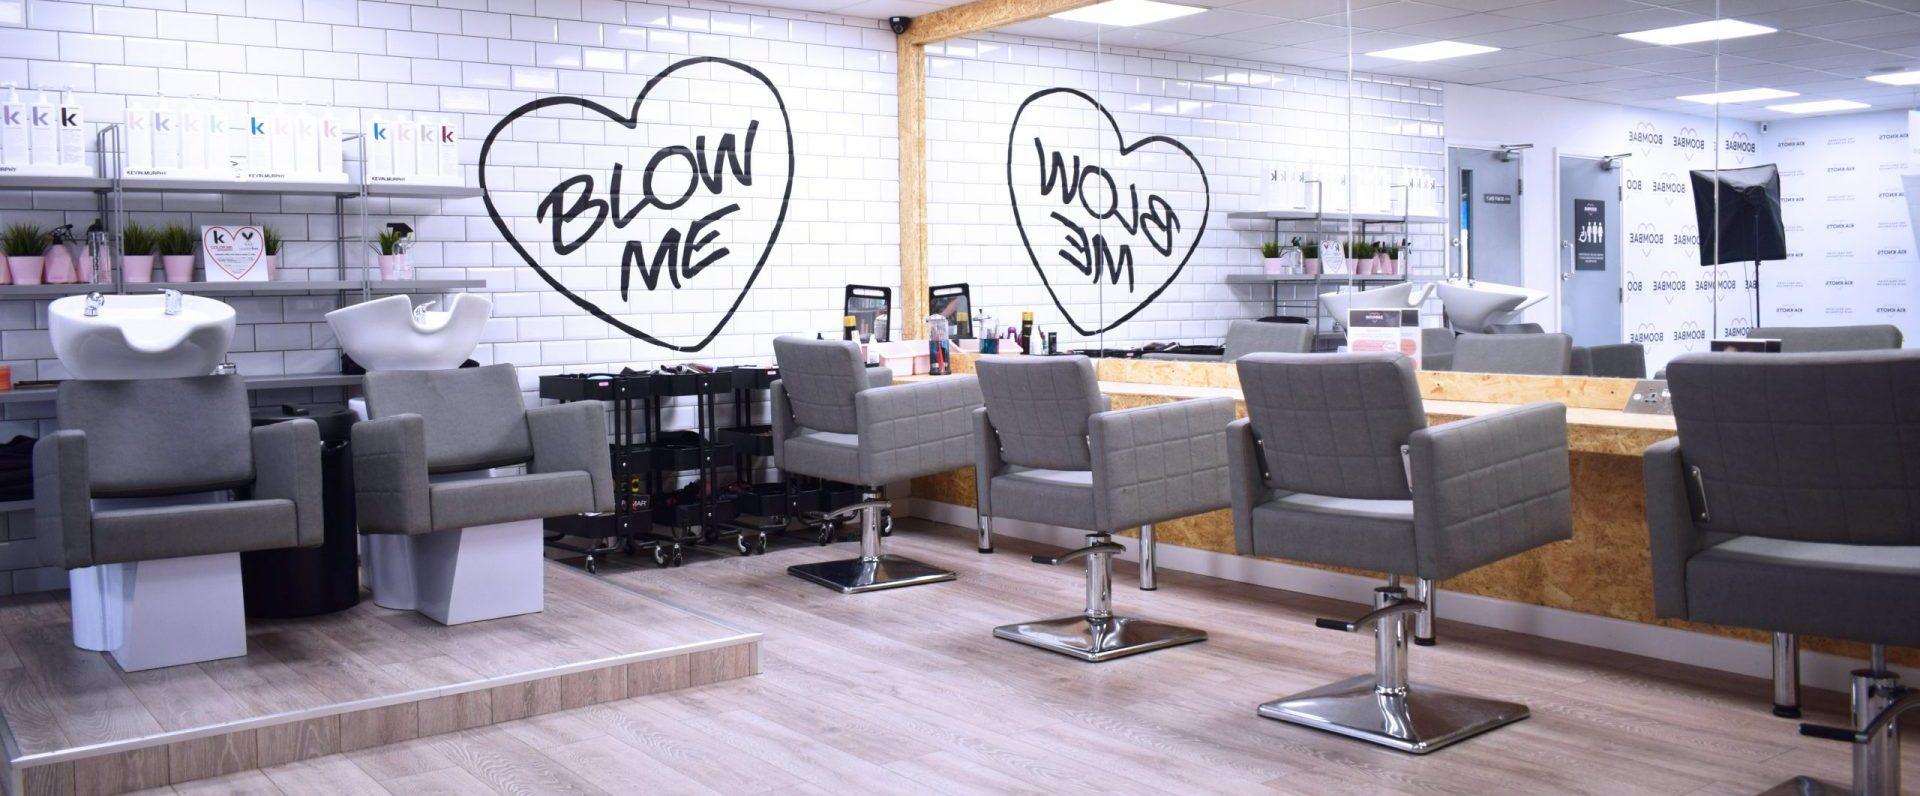 Boombae Manchester - Hair salon Manchester